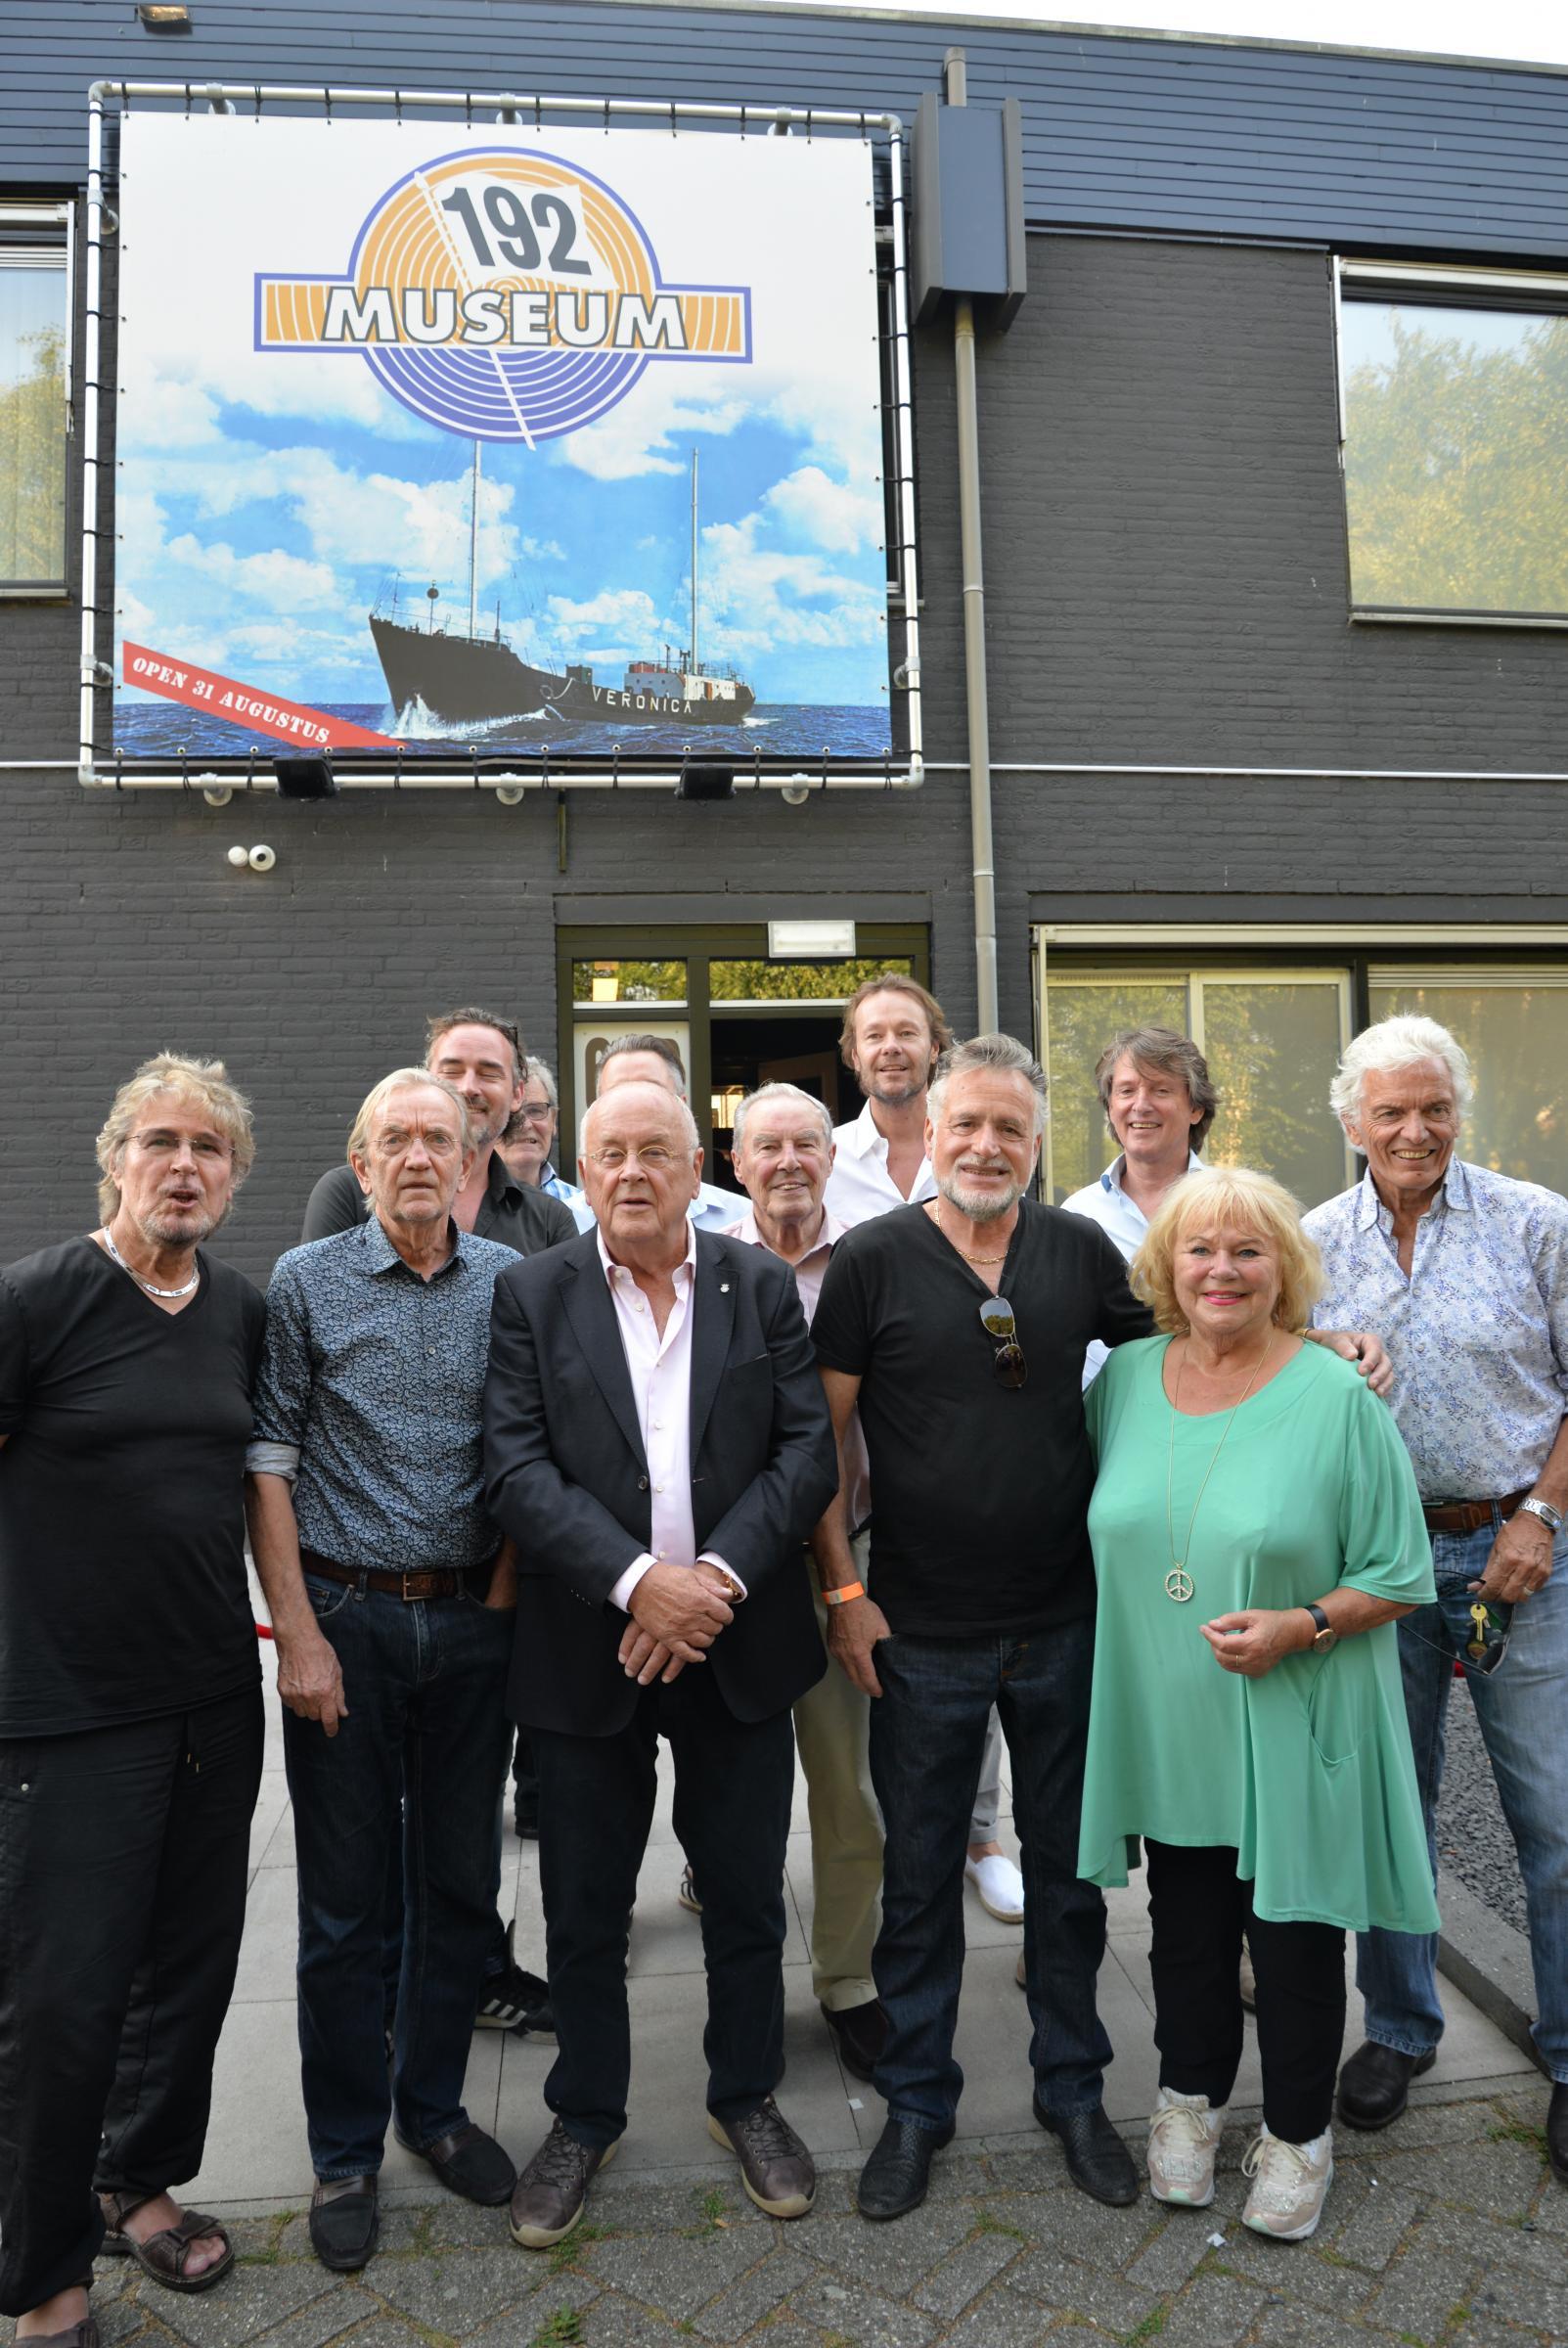 Groepsfoto 192 Museum Nijkerk